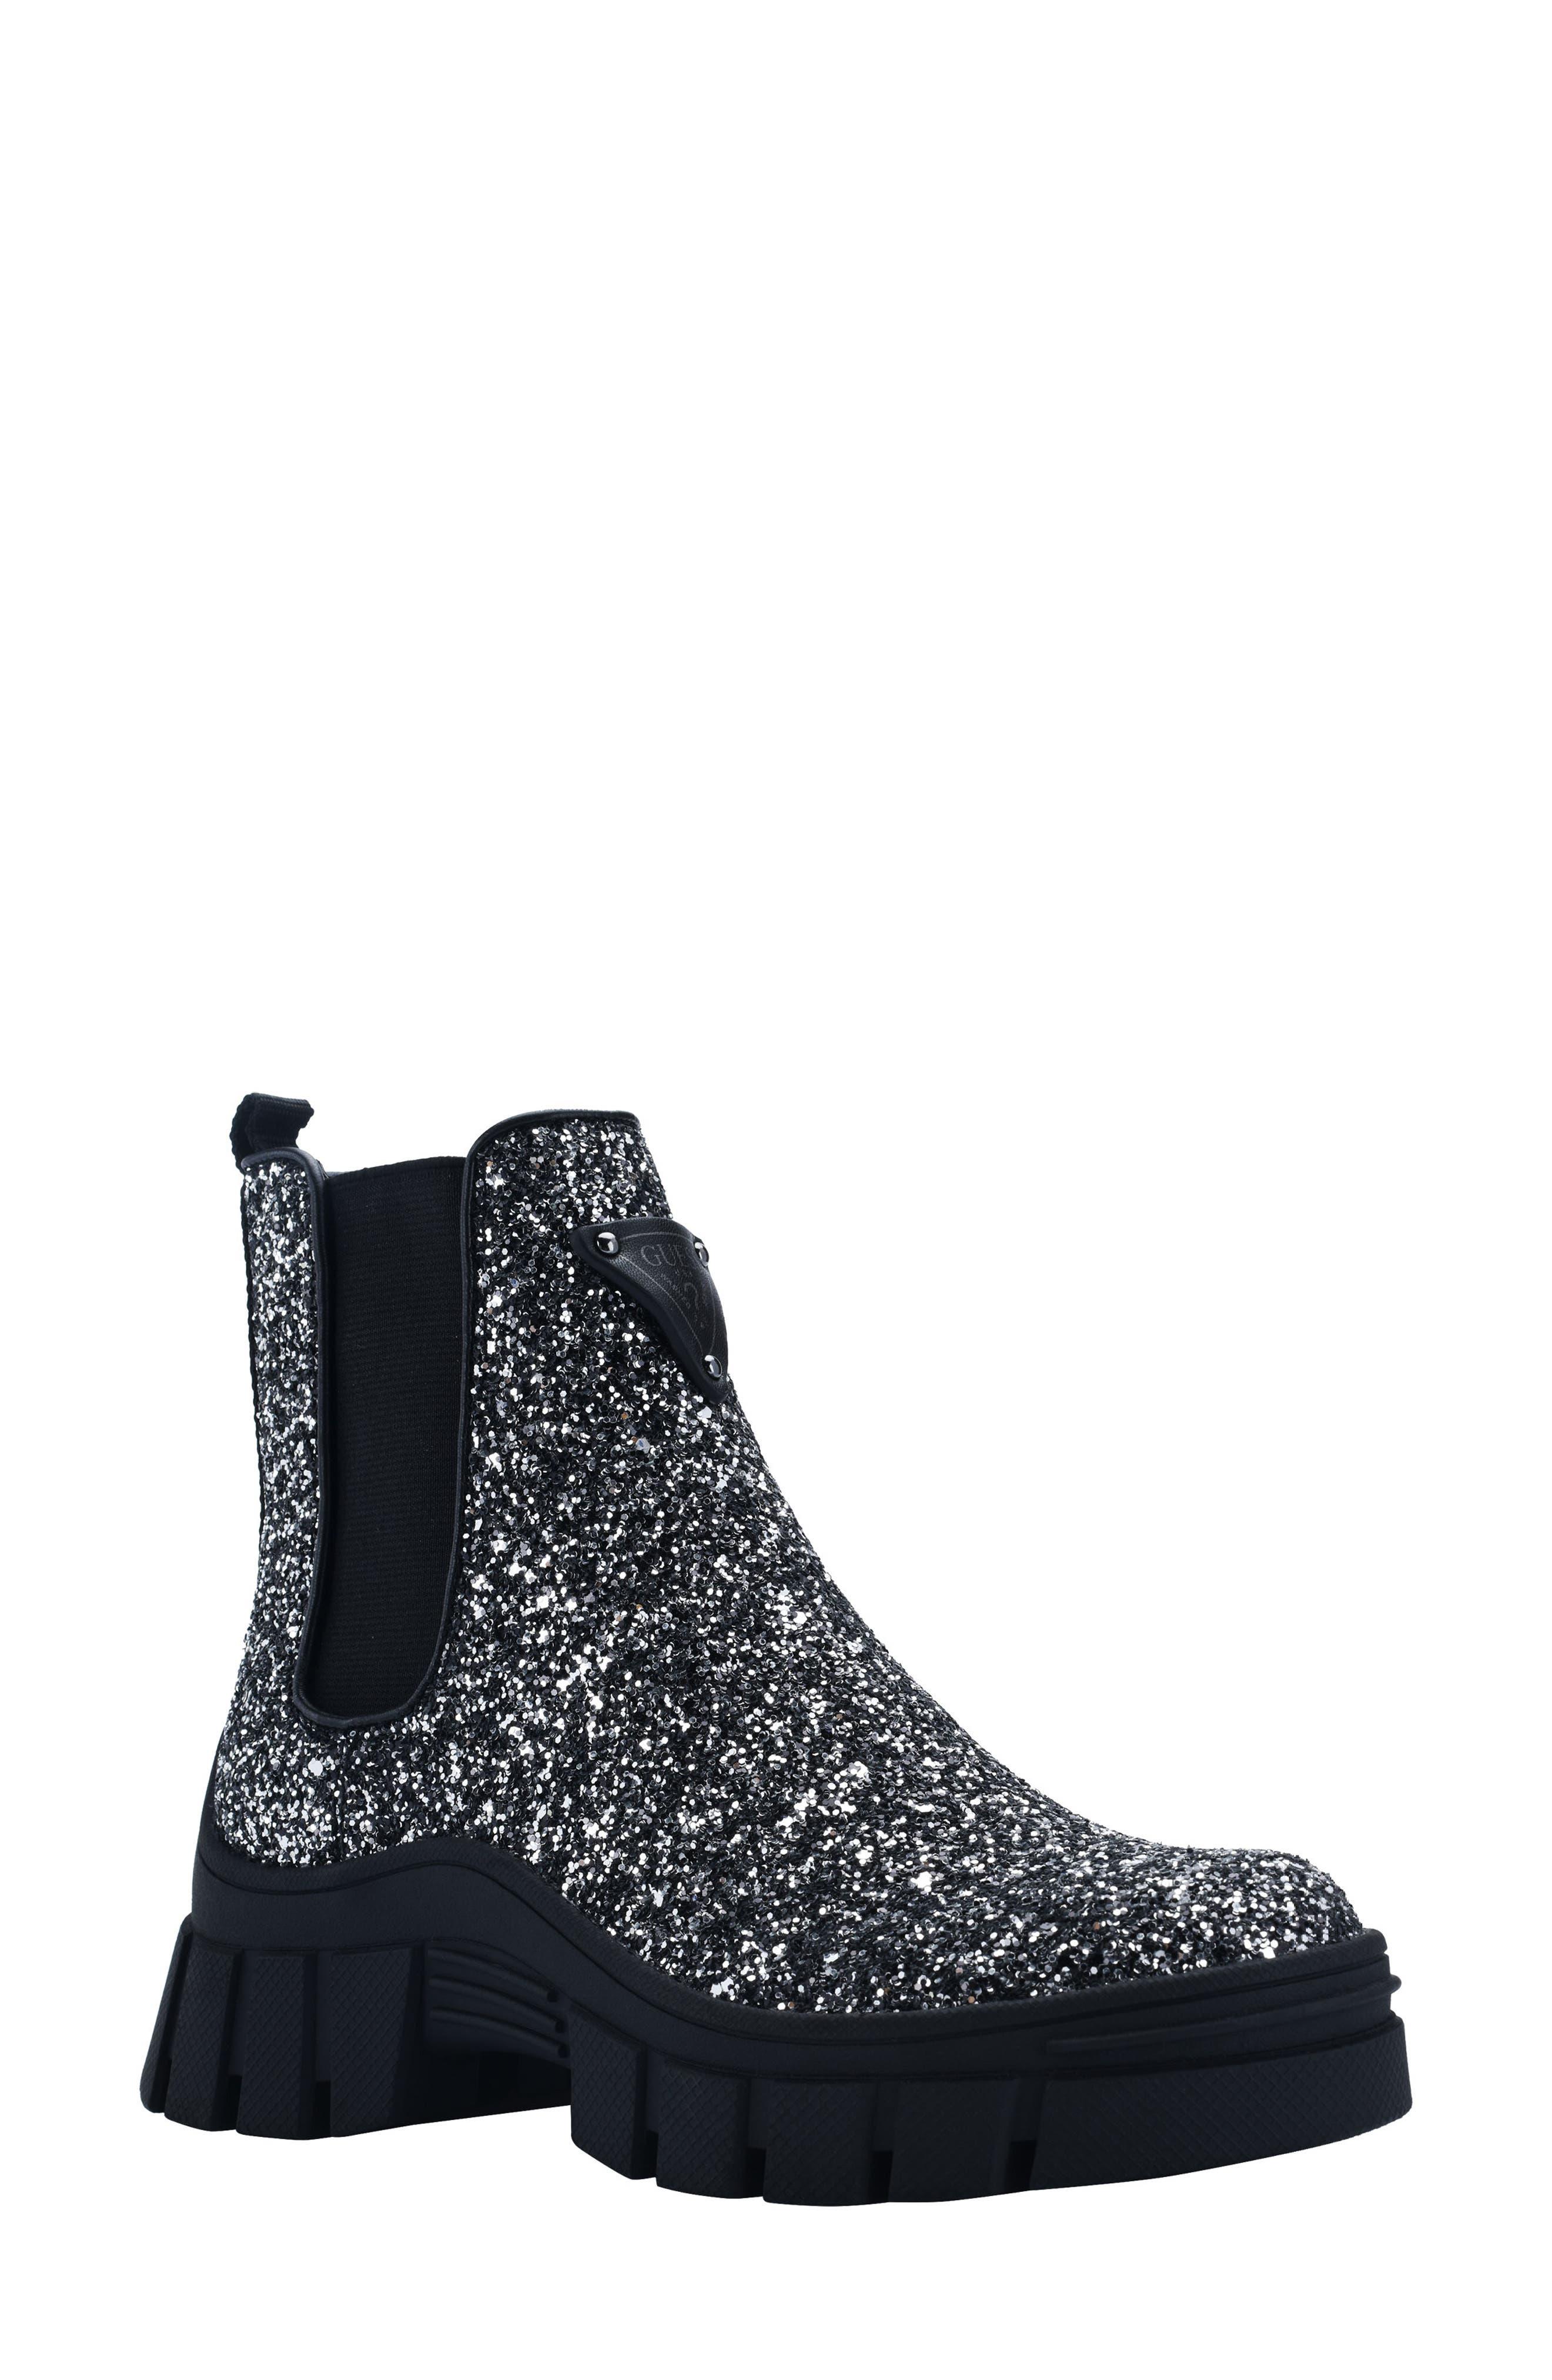 Hestia Chelsea Boot